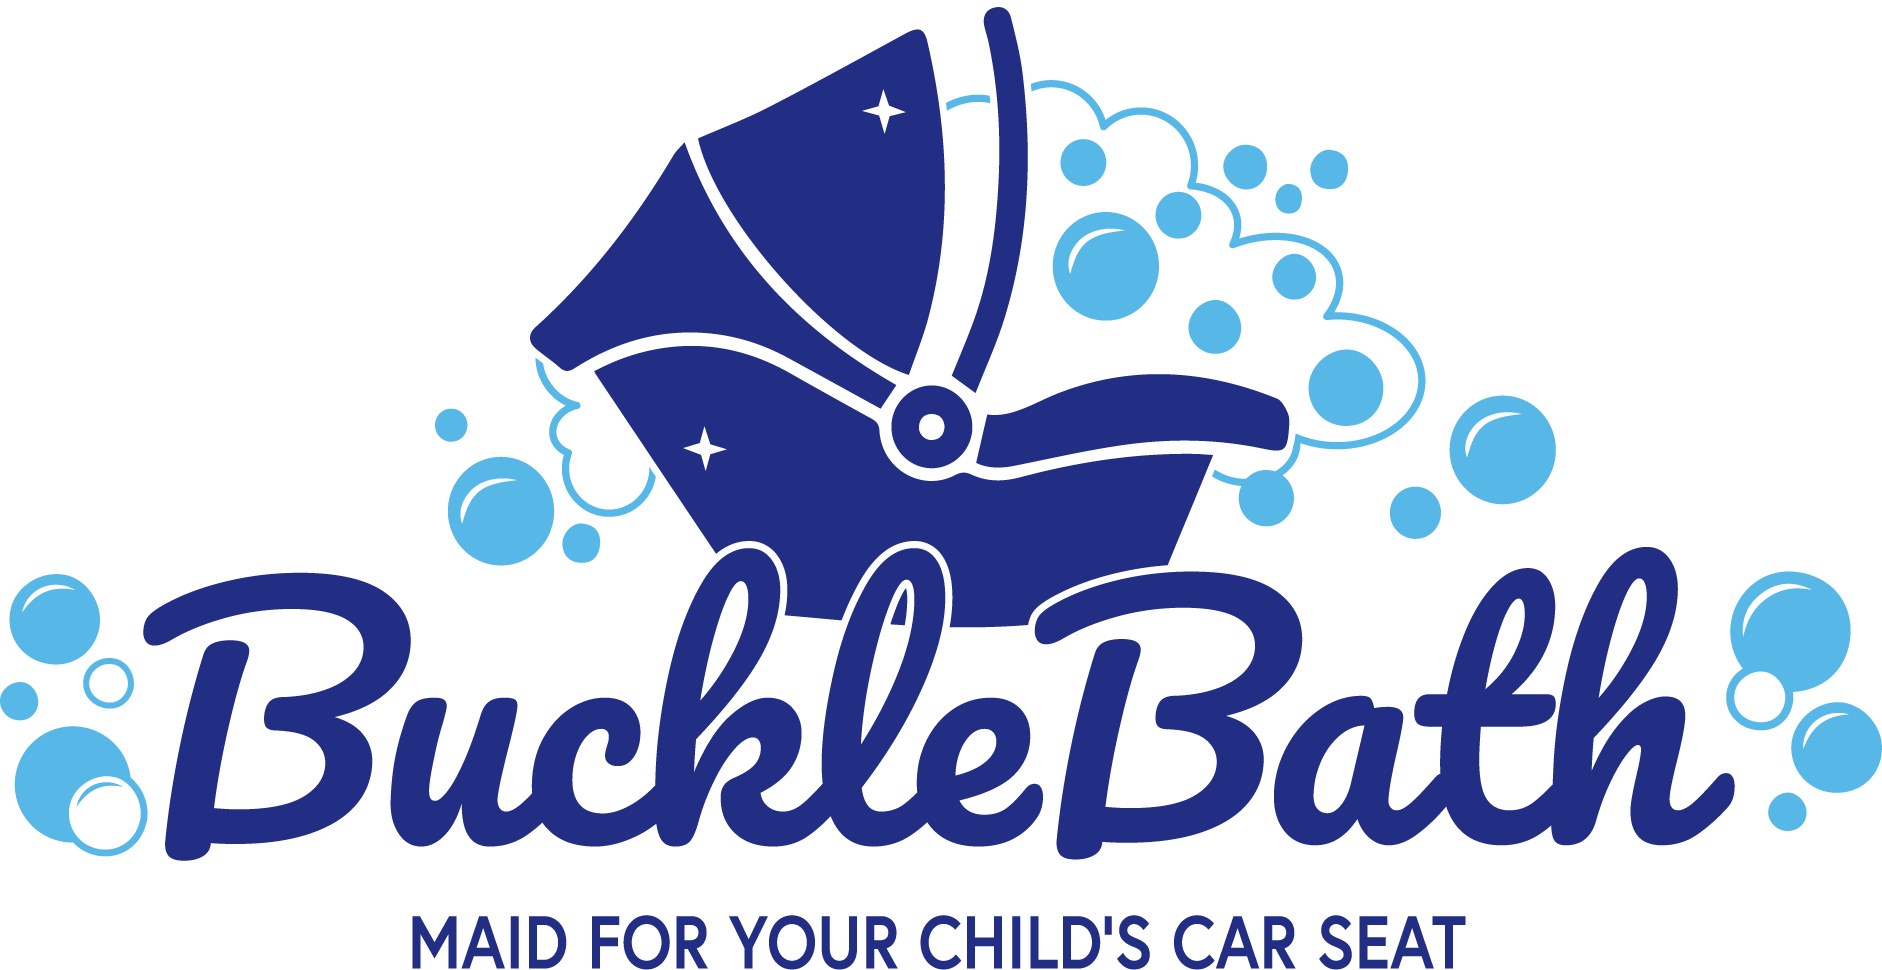 bucklebath_mark_alternate.png